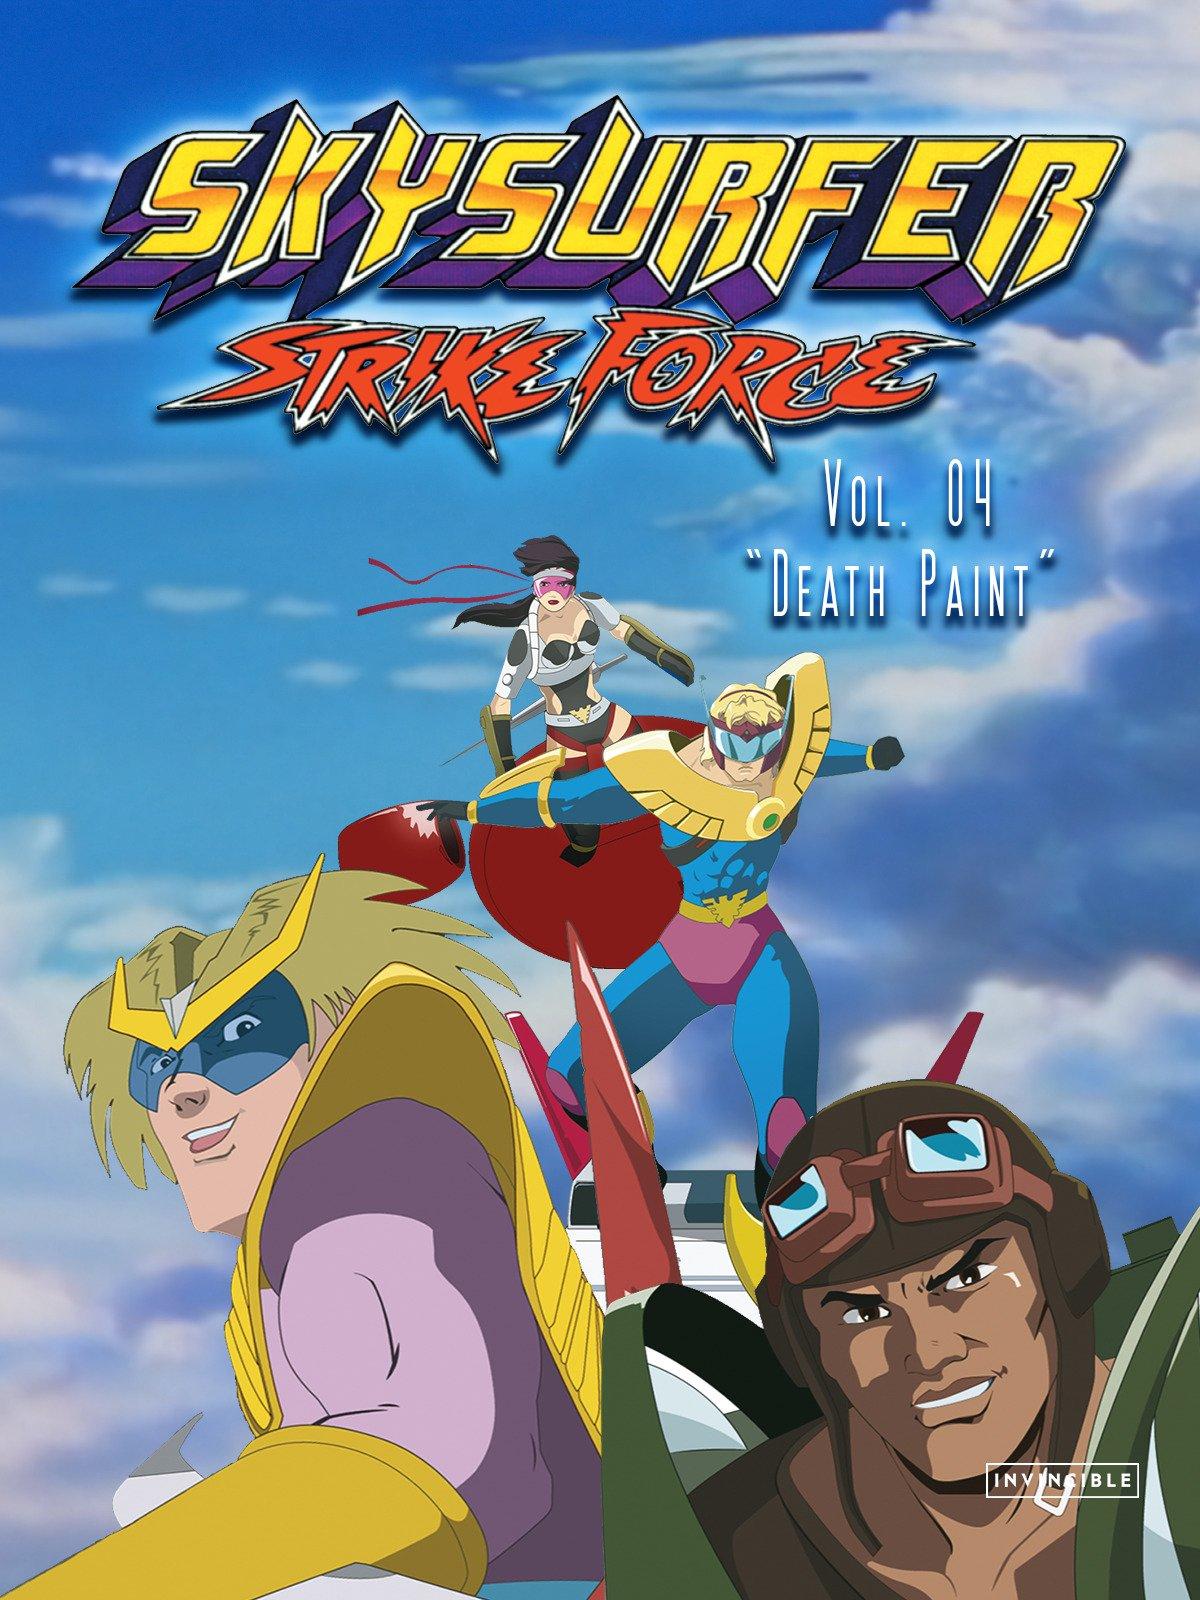 Skysurfer Strike Force Vol. 04Death Paint on Amazon Prime Video UK